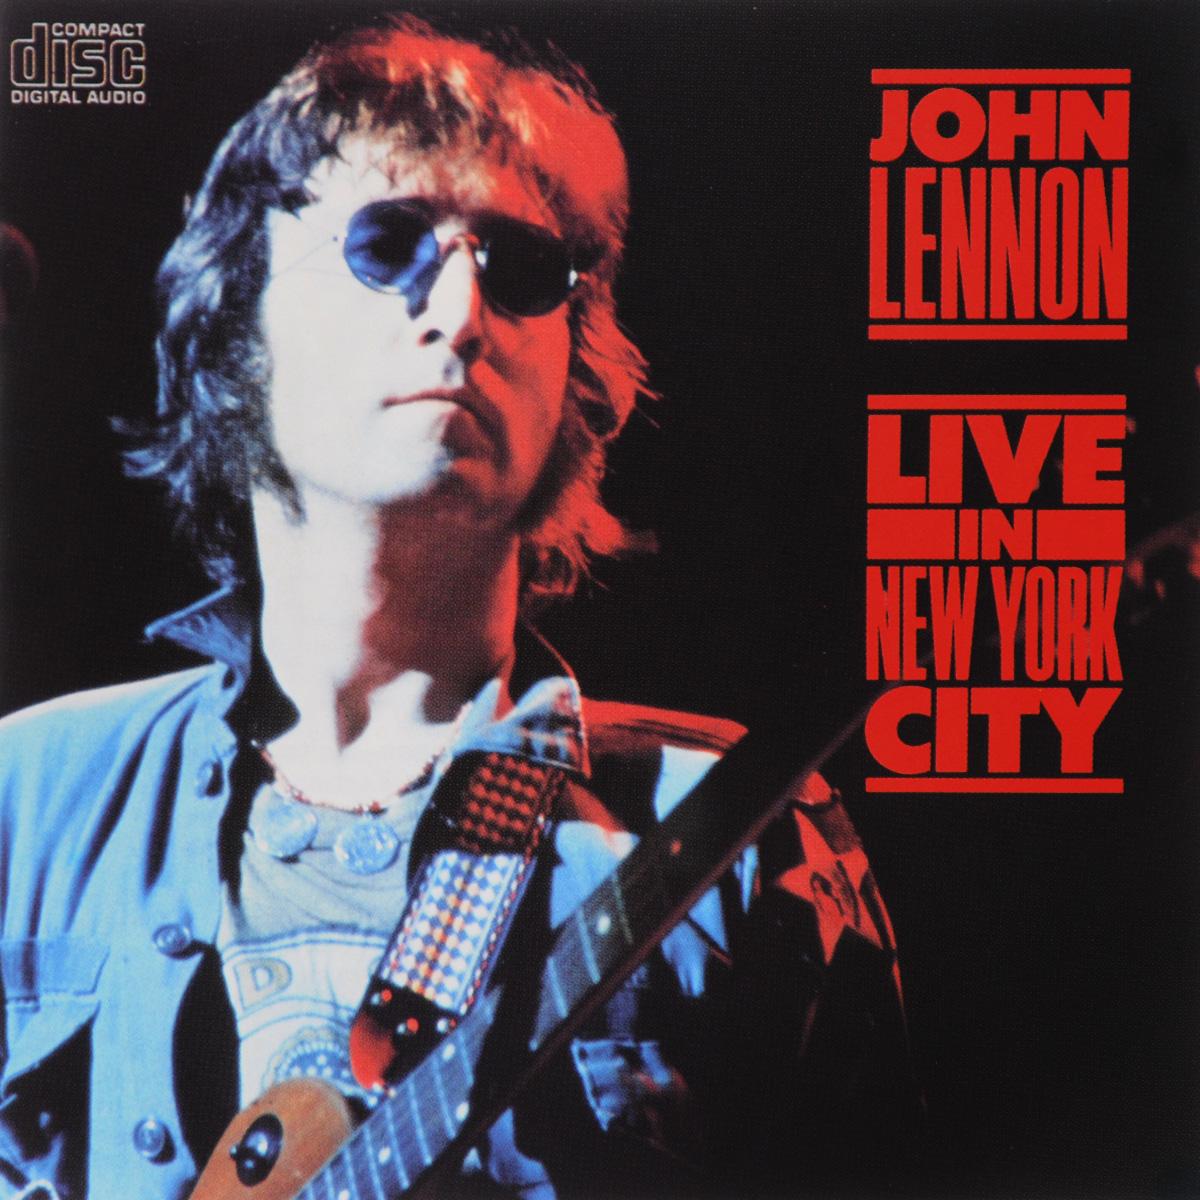 Джон Леннон John Lennon. Live In New York City paul simon live in new york city blu ray